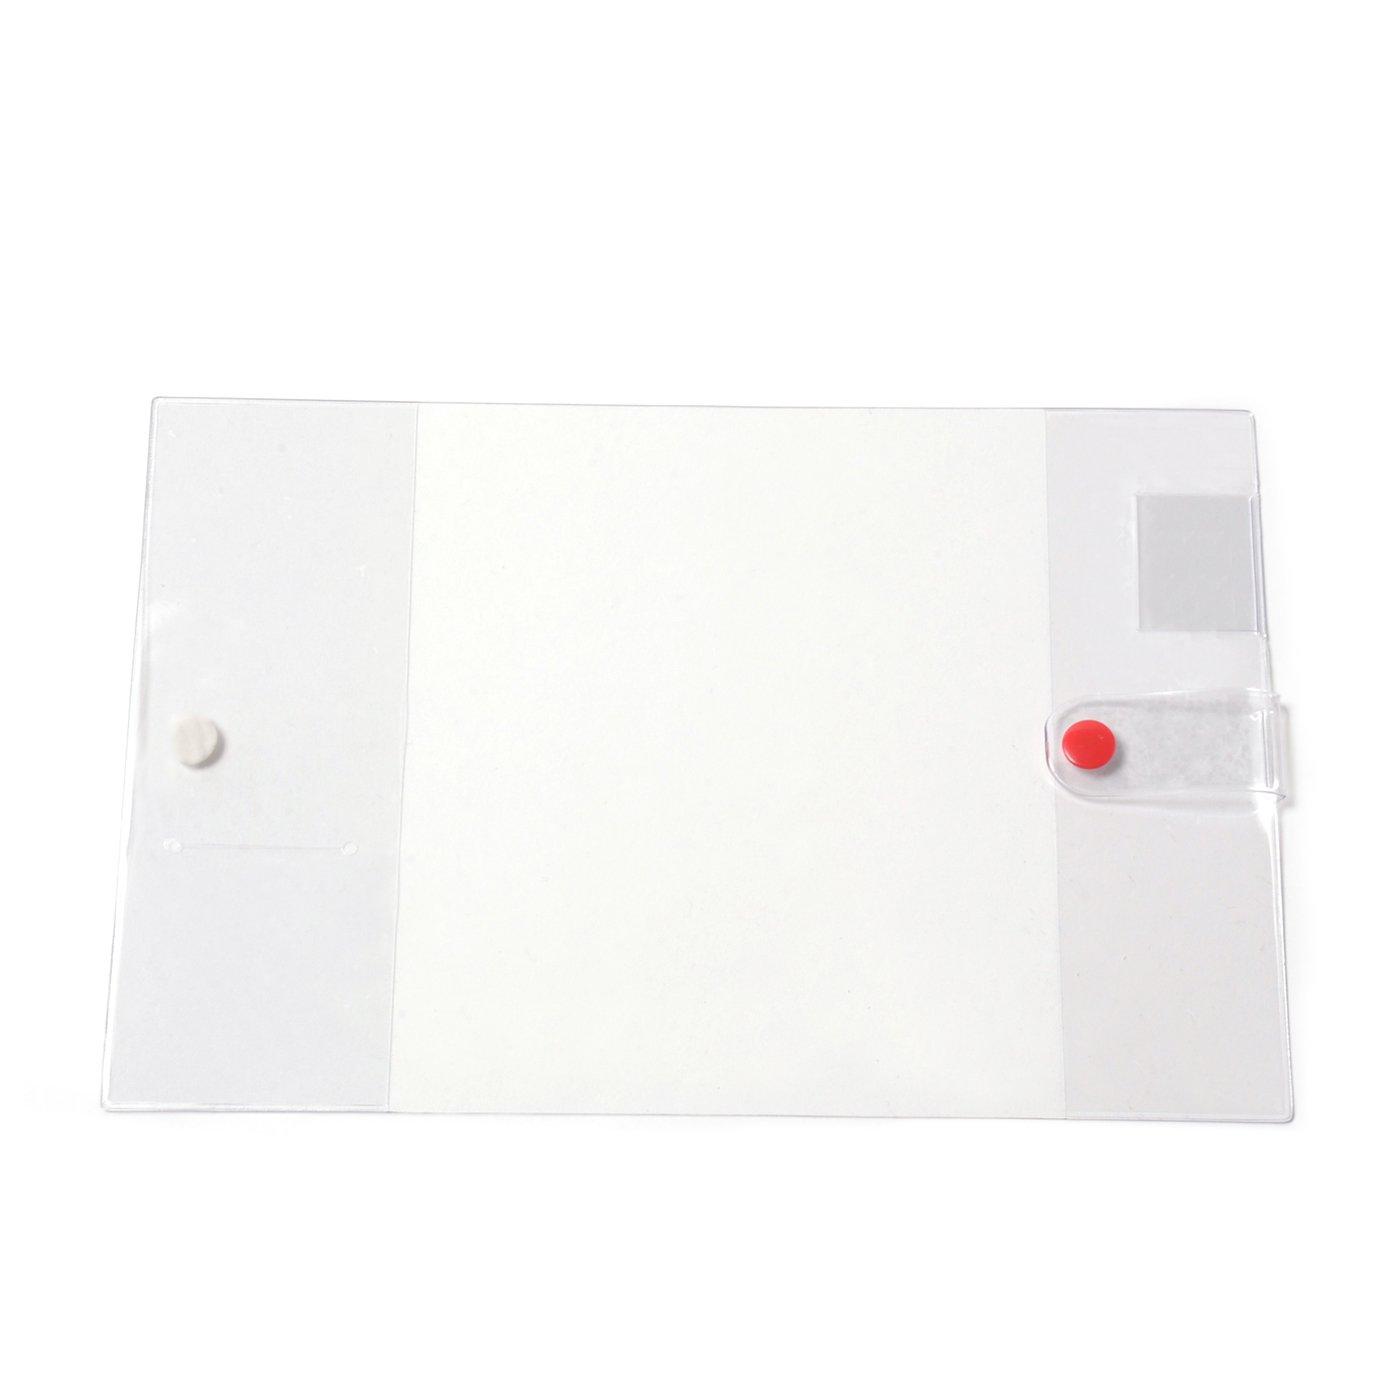 SF STUDIO 赤いボタンの透明カバー